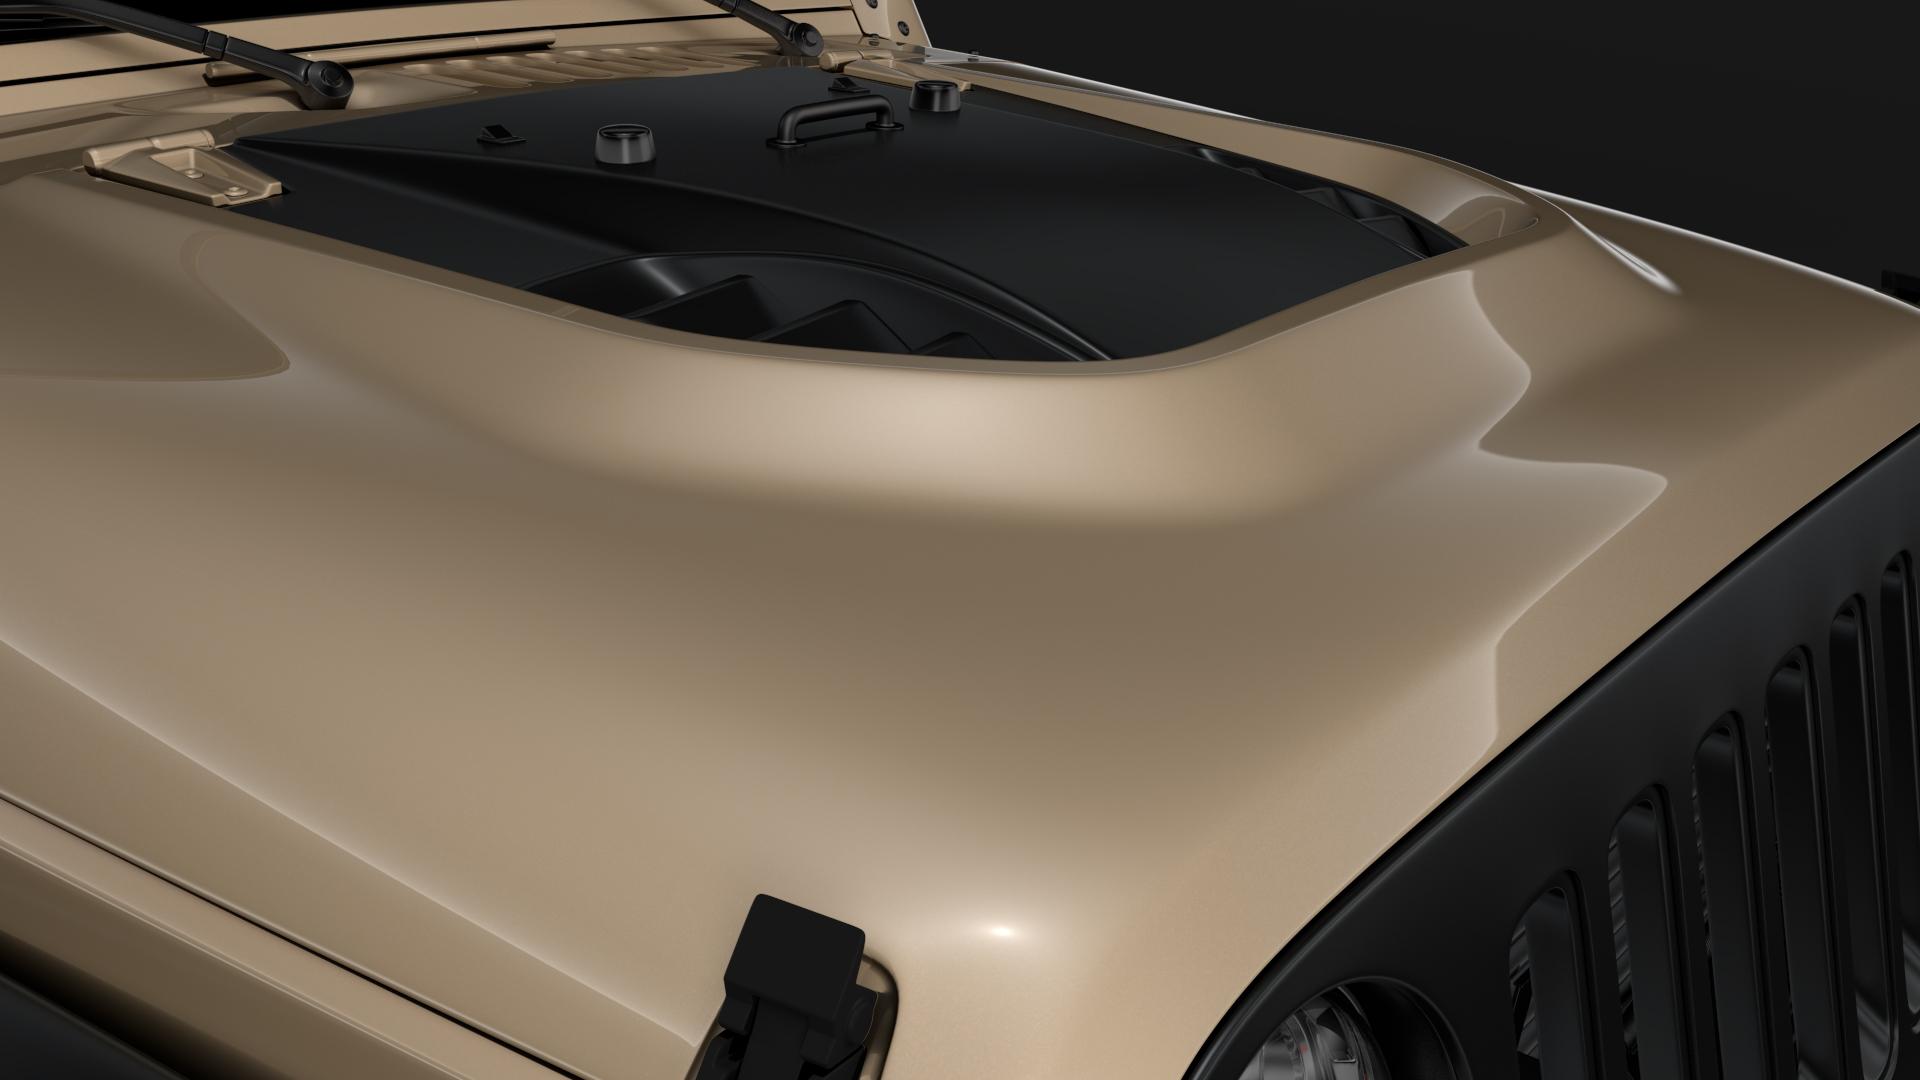 jeep wrangler rubicon recon jk 2017 3d model max fbx lwo ma mb hrc xsi obj 276946